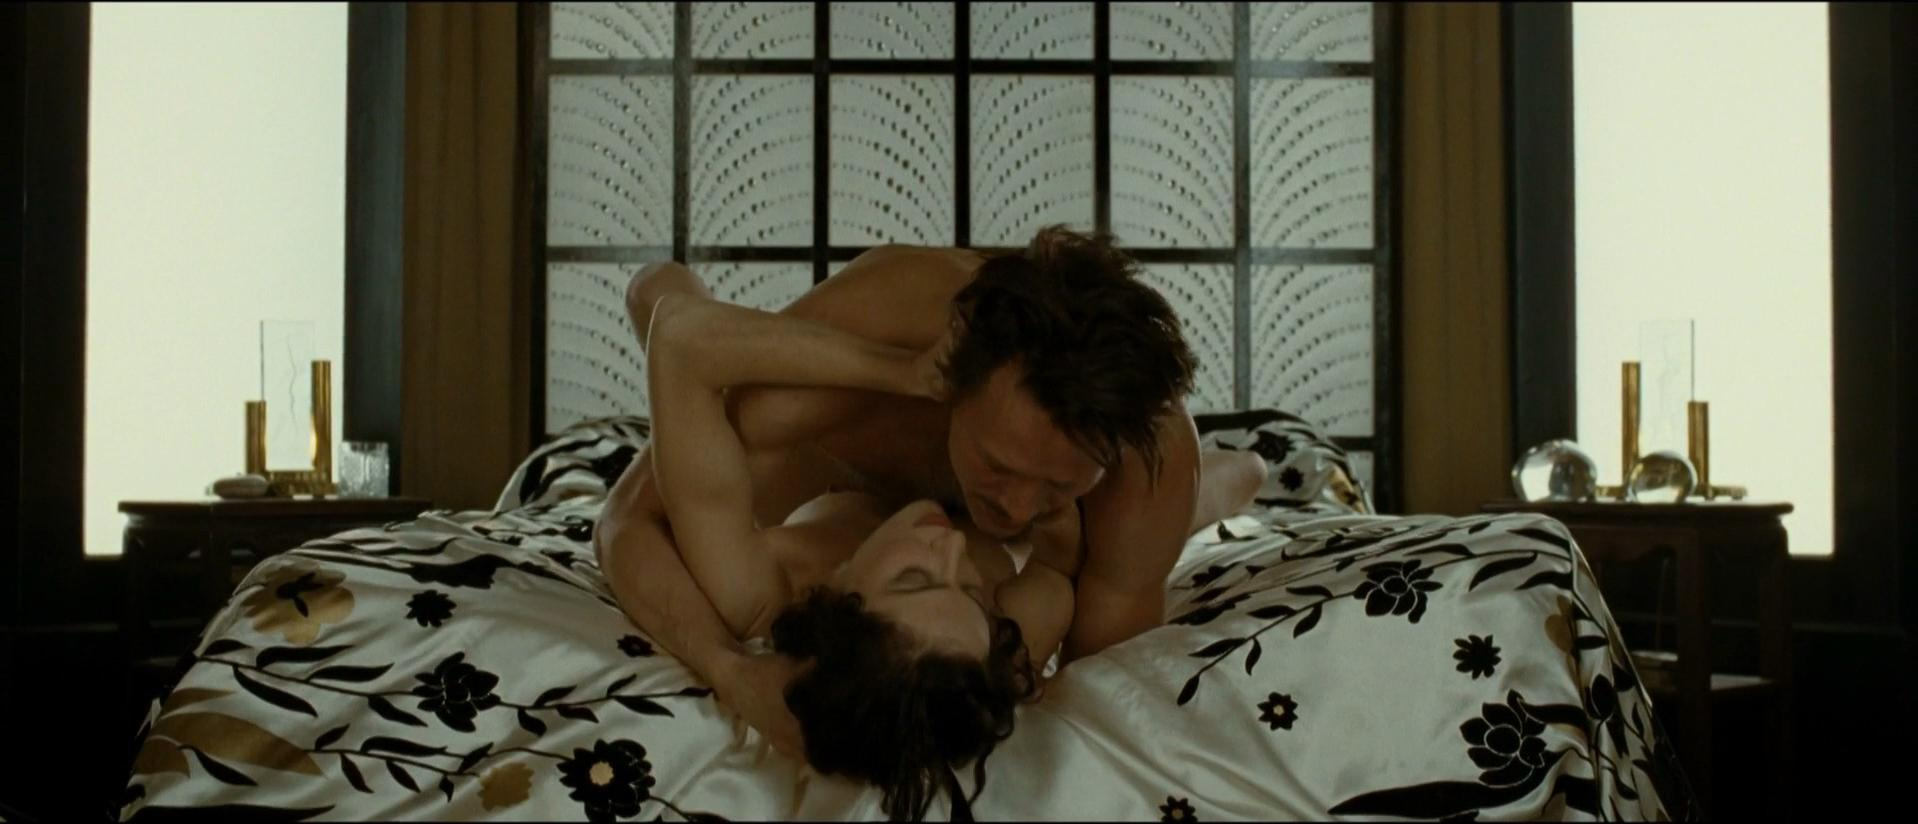 Anna Mouglalis nude - Coco Chanel & Igor Stravinsky (2009)